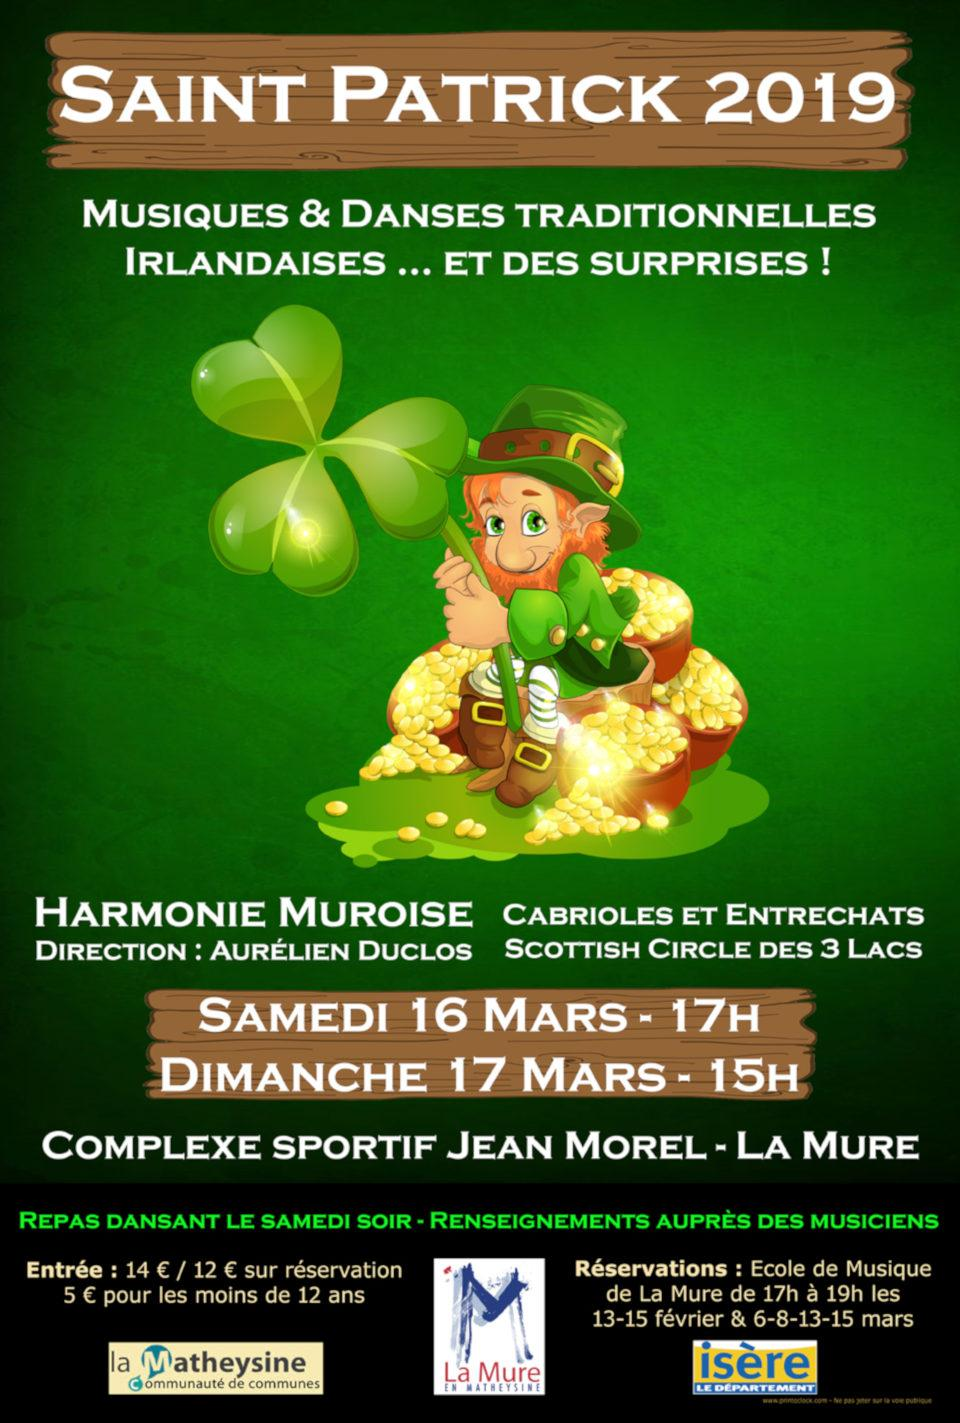 Affiche St Patrick 2019 Harmonie Muroise